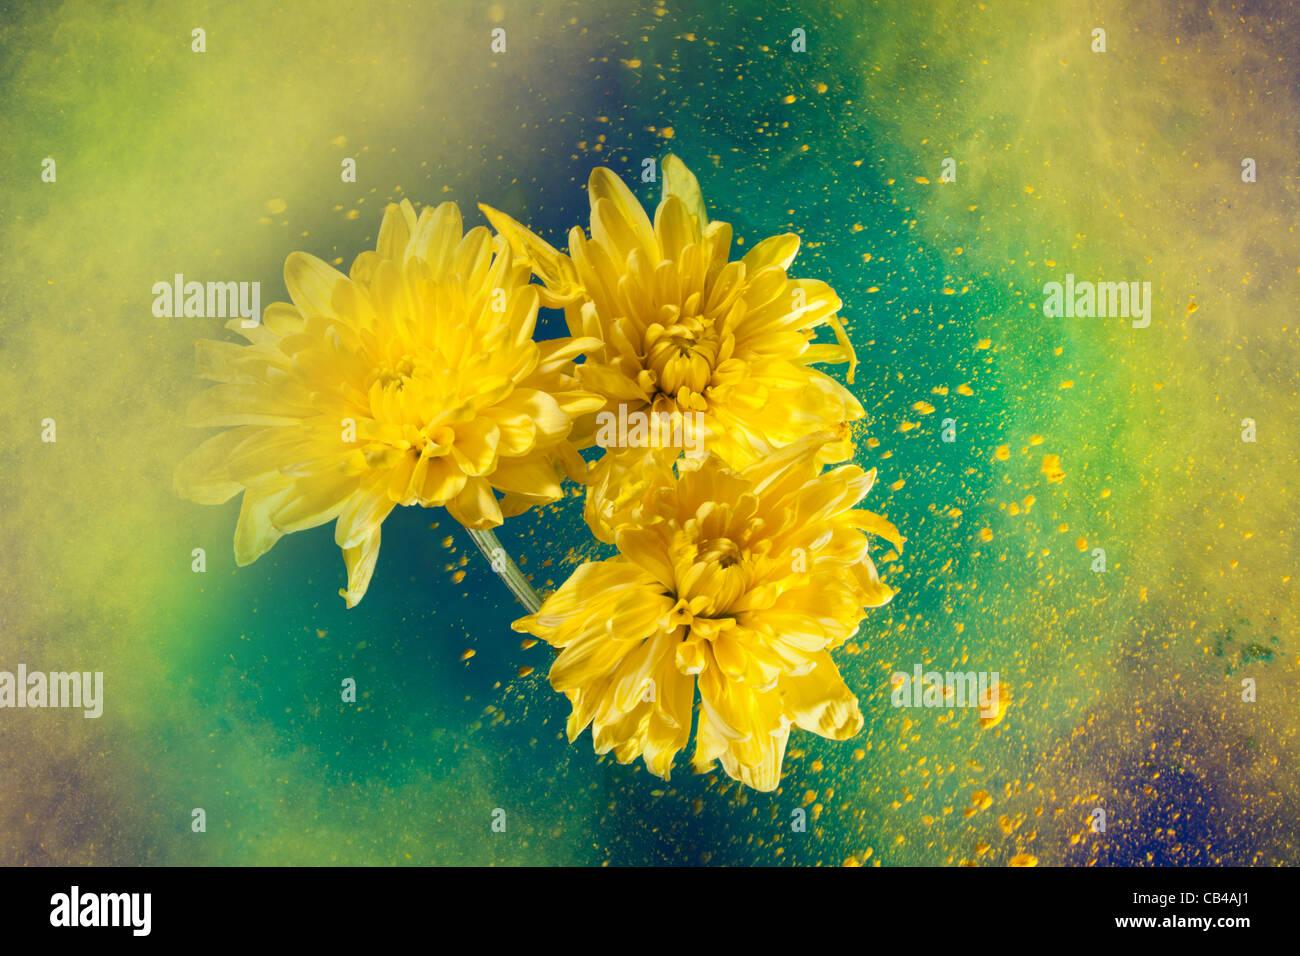 Golden Paint Splash Background Stock Photos & Golden Paint Splash ...